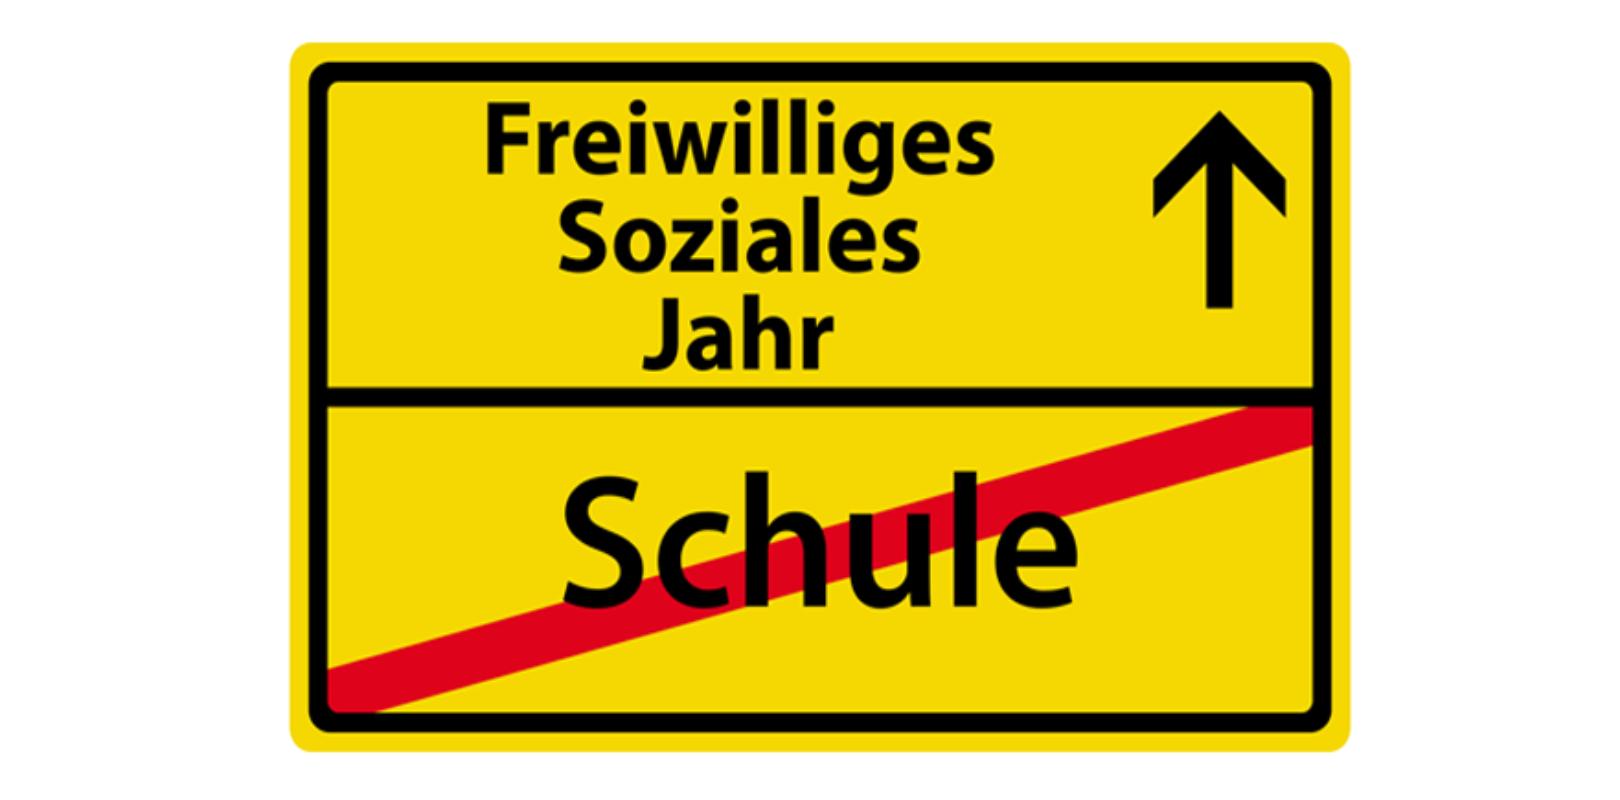 Fsj In österreich